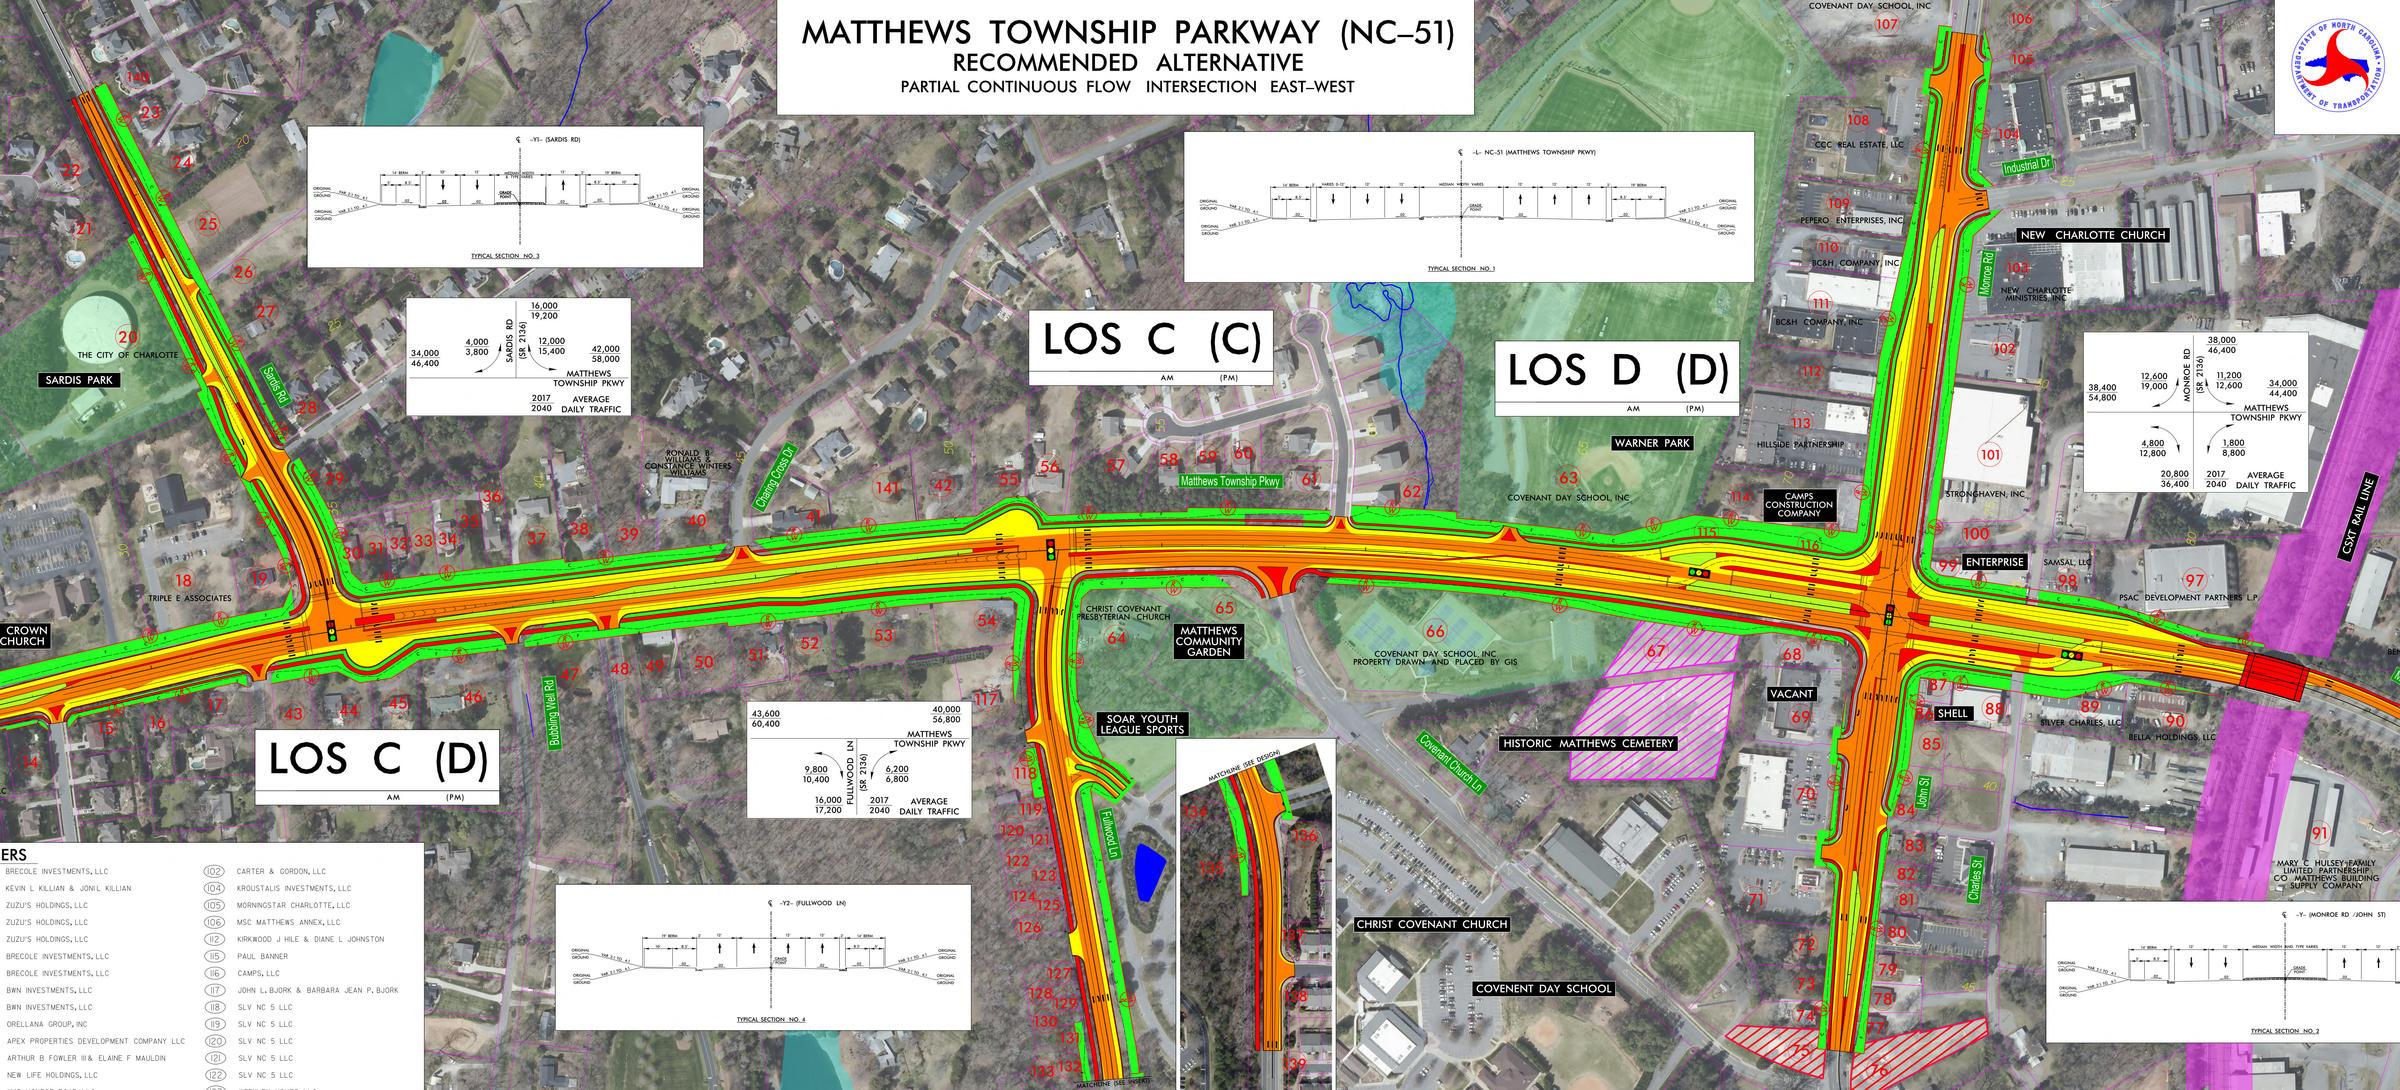 Widening Bicycle Lanes Planned On Highway 51 In Matthews Wfae